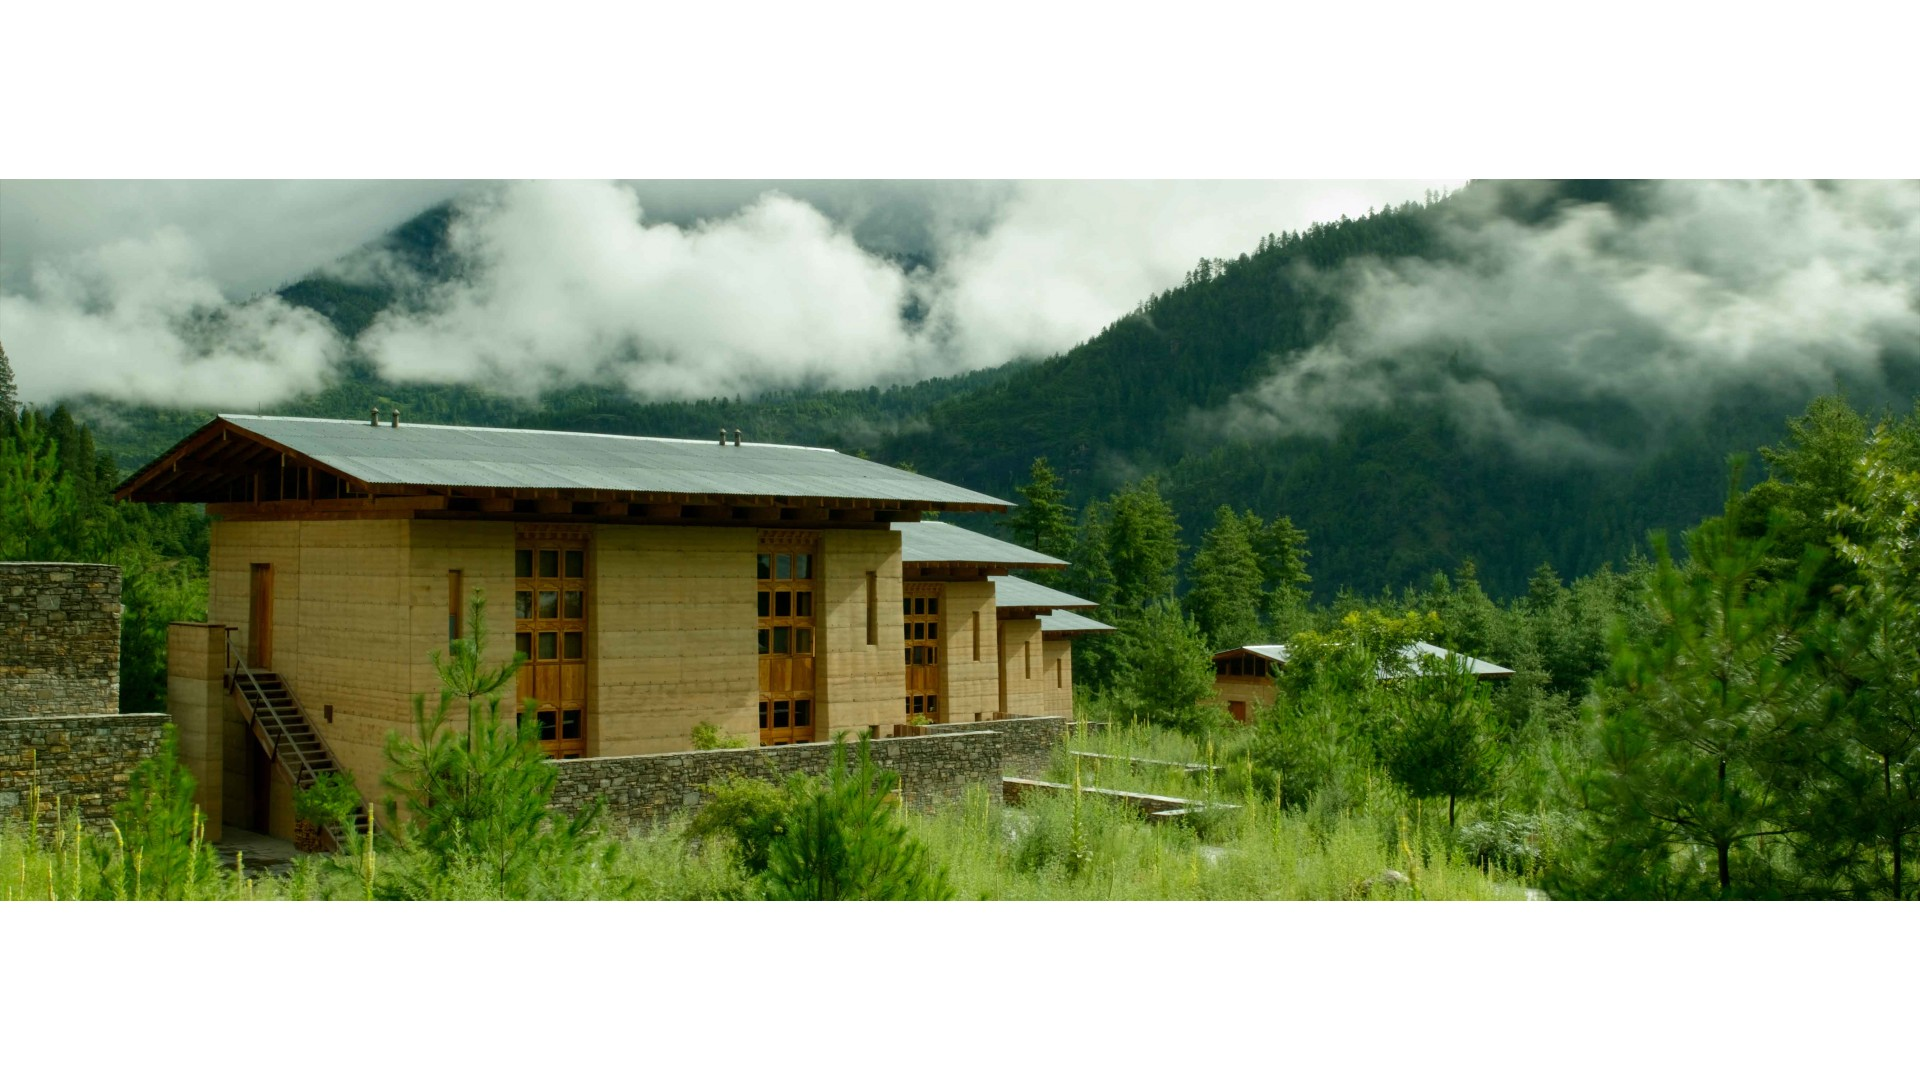 Amankora hotel thimphu bhutan dating